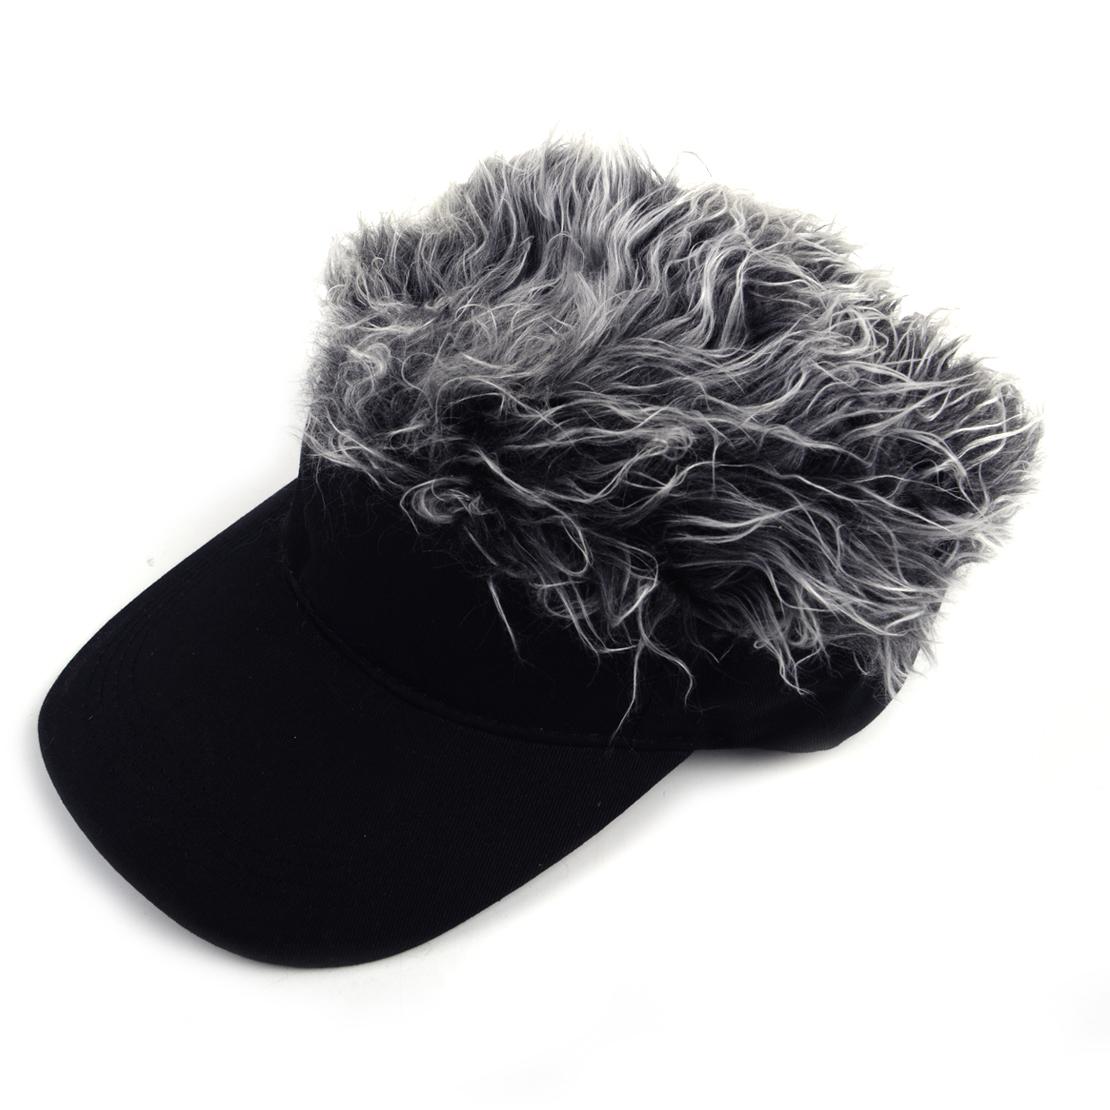 c1287aed61e Details about Unisex Unique Toupee Wig Baseball Hat Hook with Loop  Adjustable Sun Visor Cap